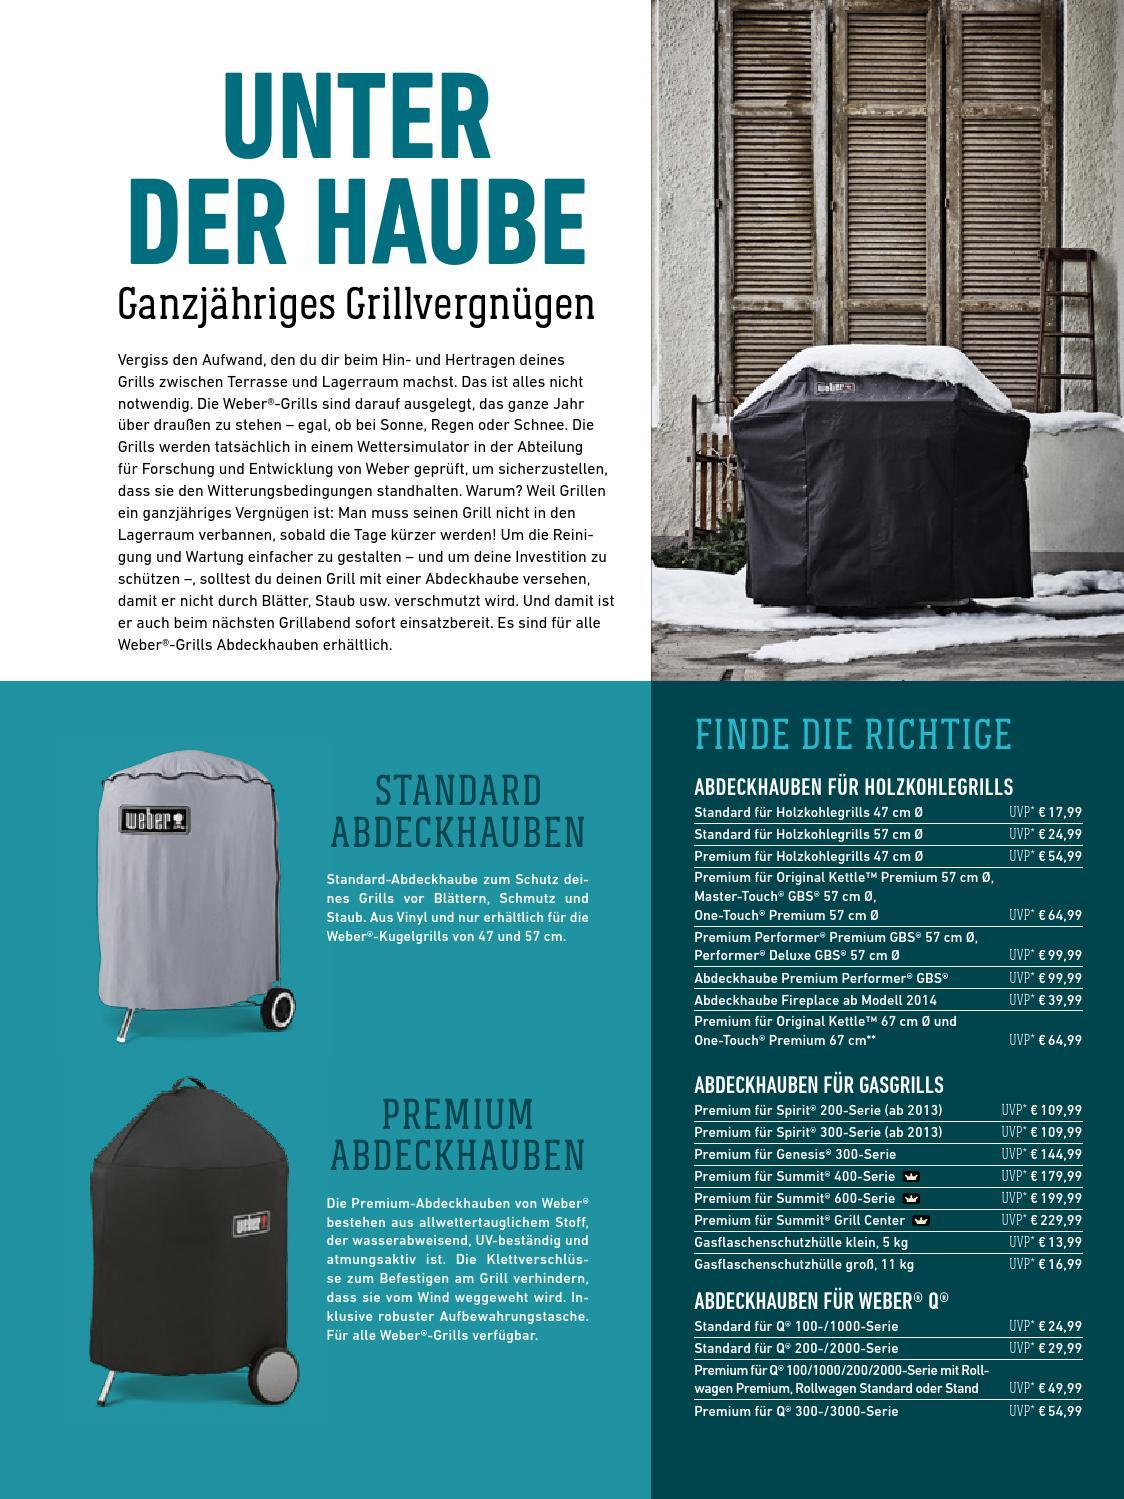 Weber Premium Abdeckhaube Spirit 200-Serie ab 2013